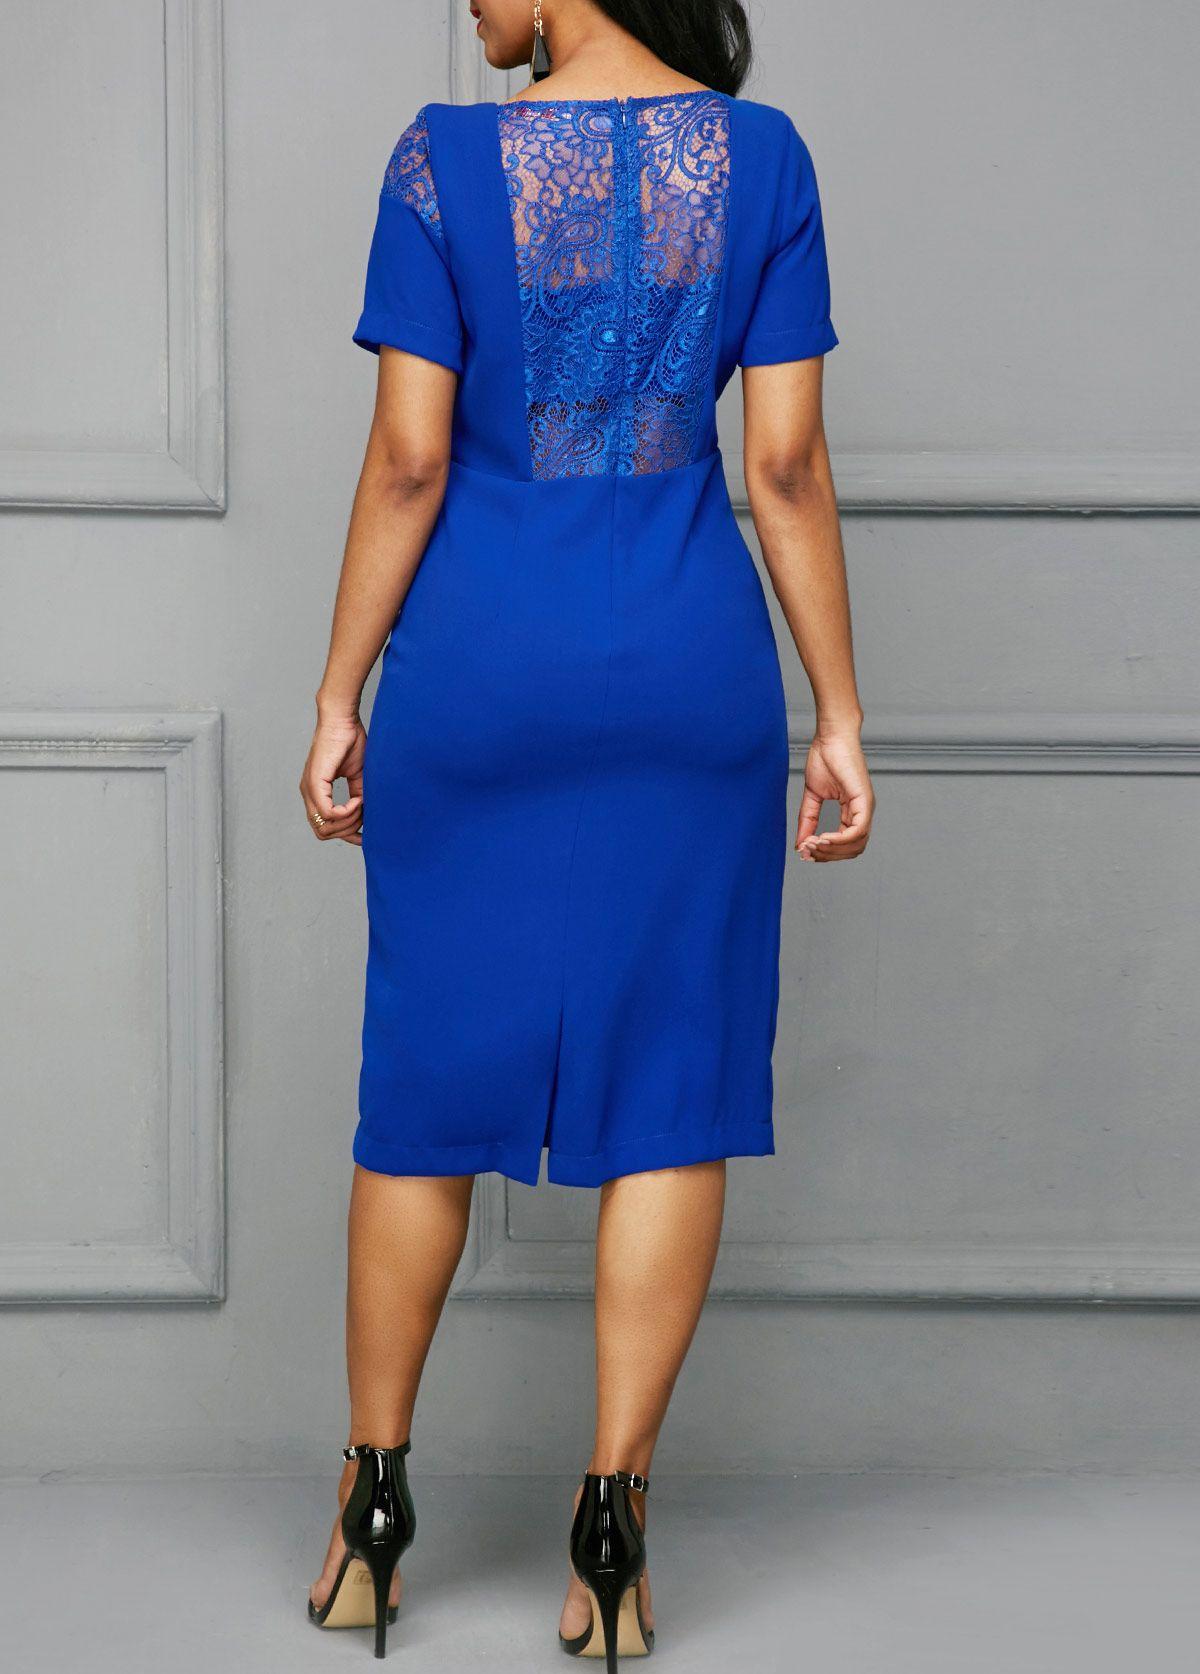 2dc84ffe2e3 Royal Blue Back Slit Lace Panel Dress